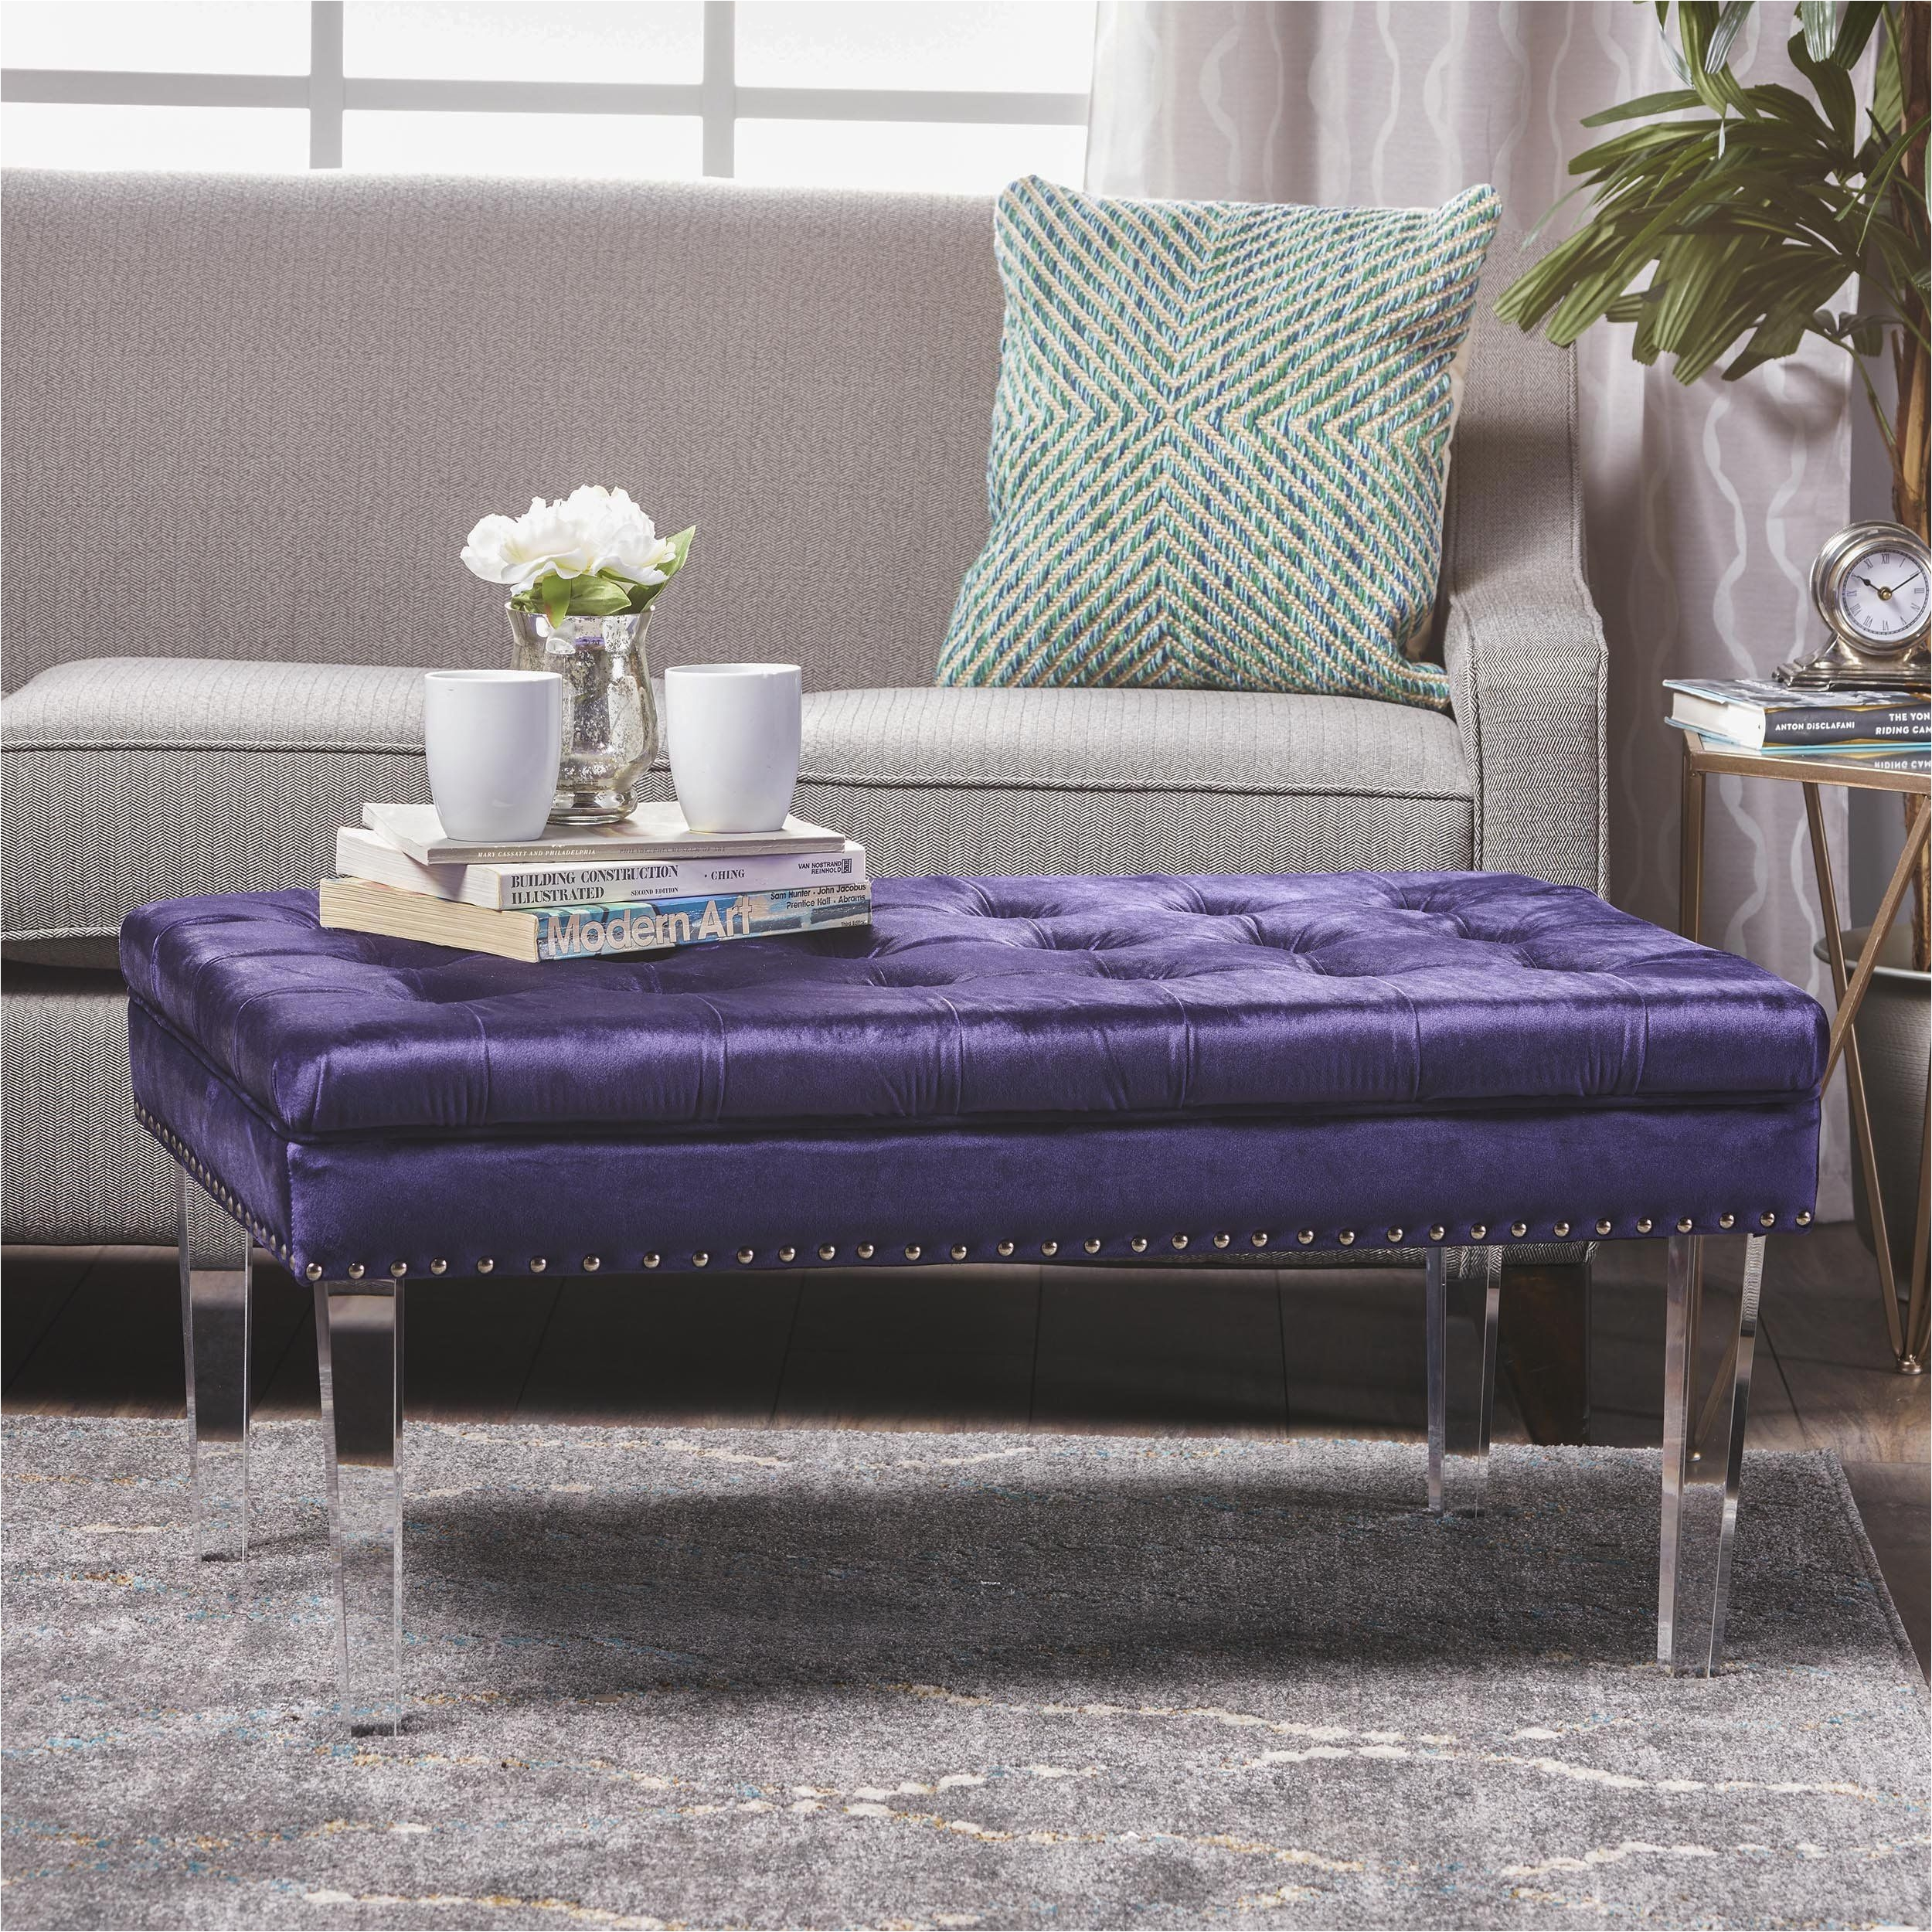 Colonial Tufted Cushion New Velvet Ottoman